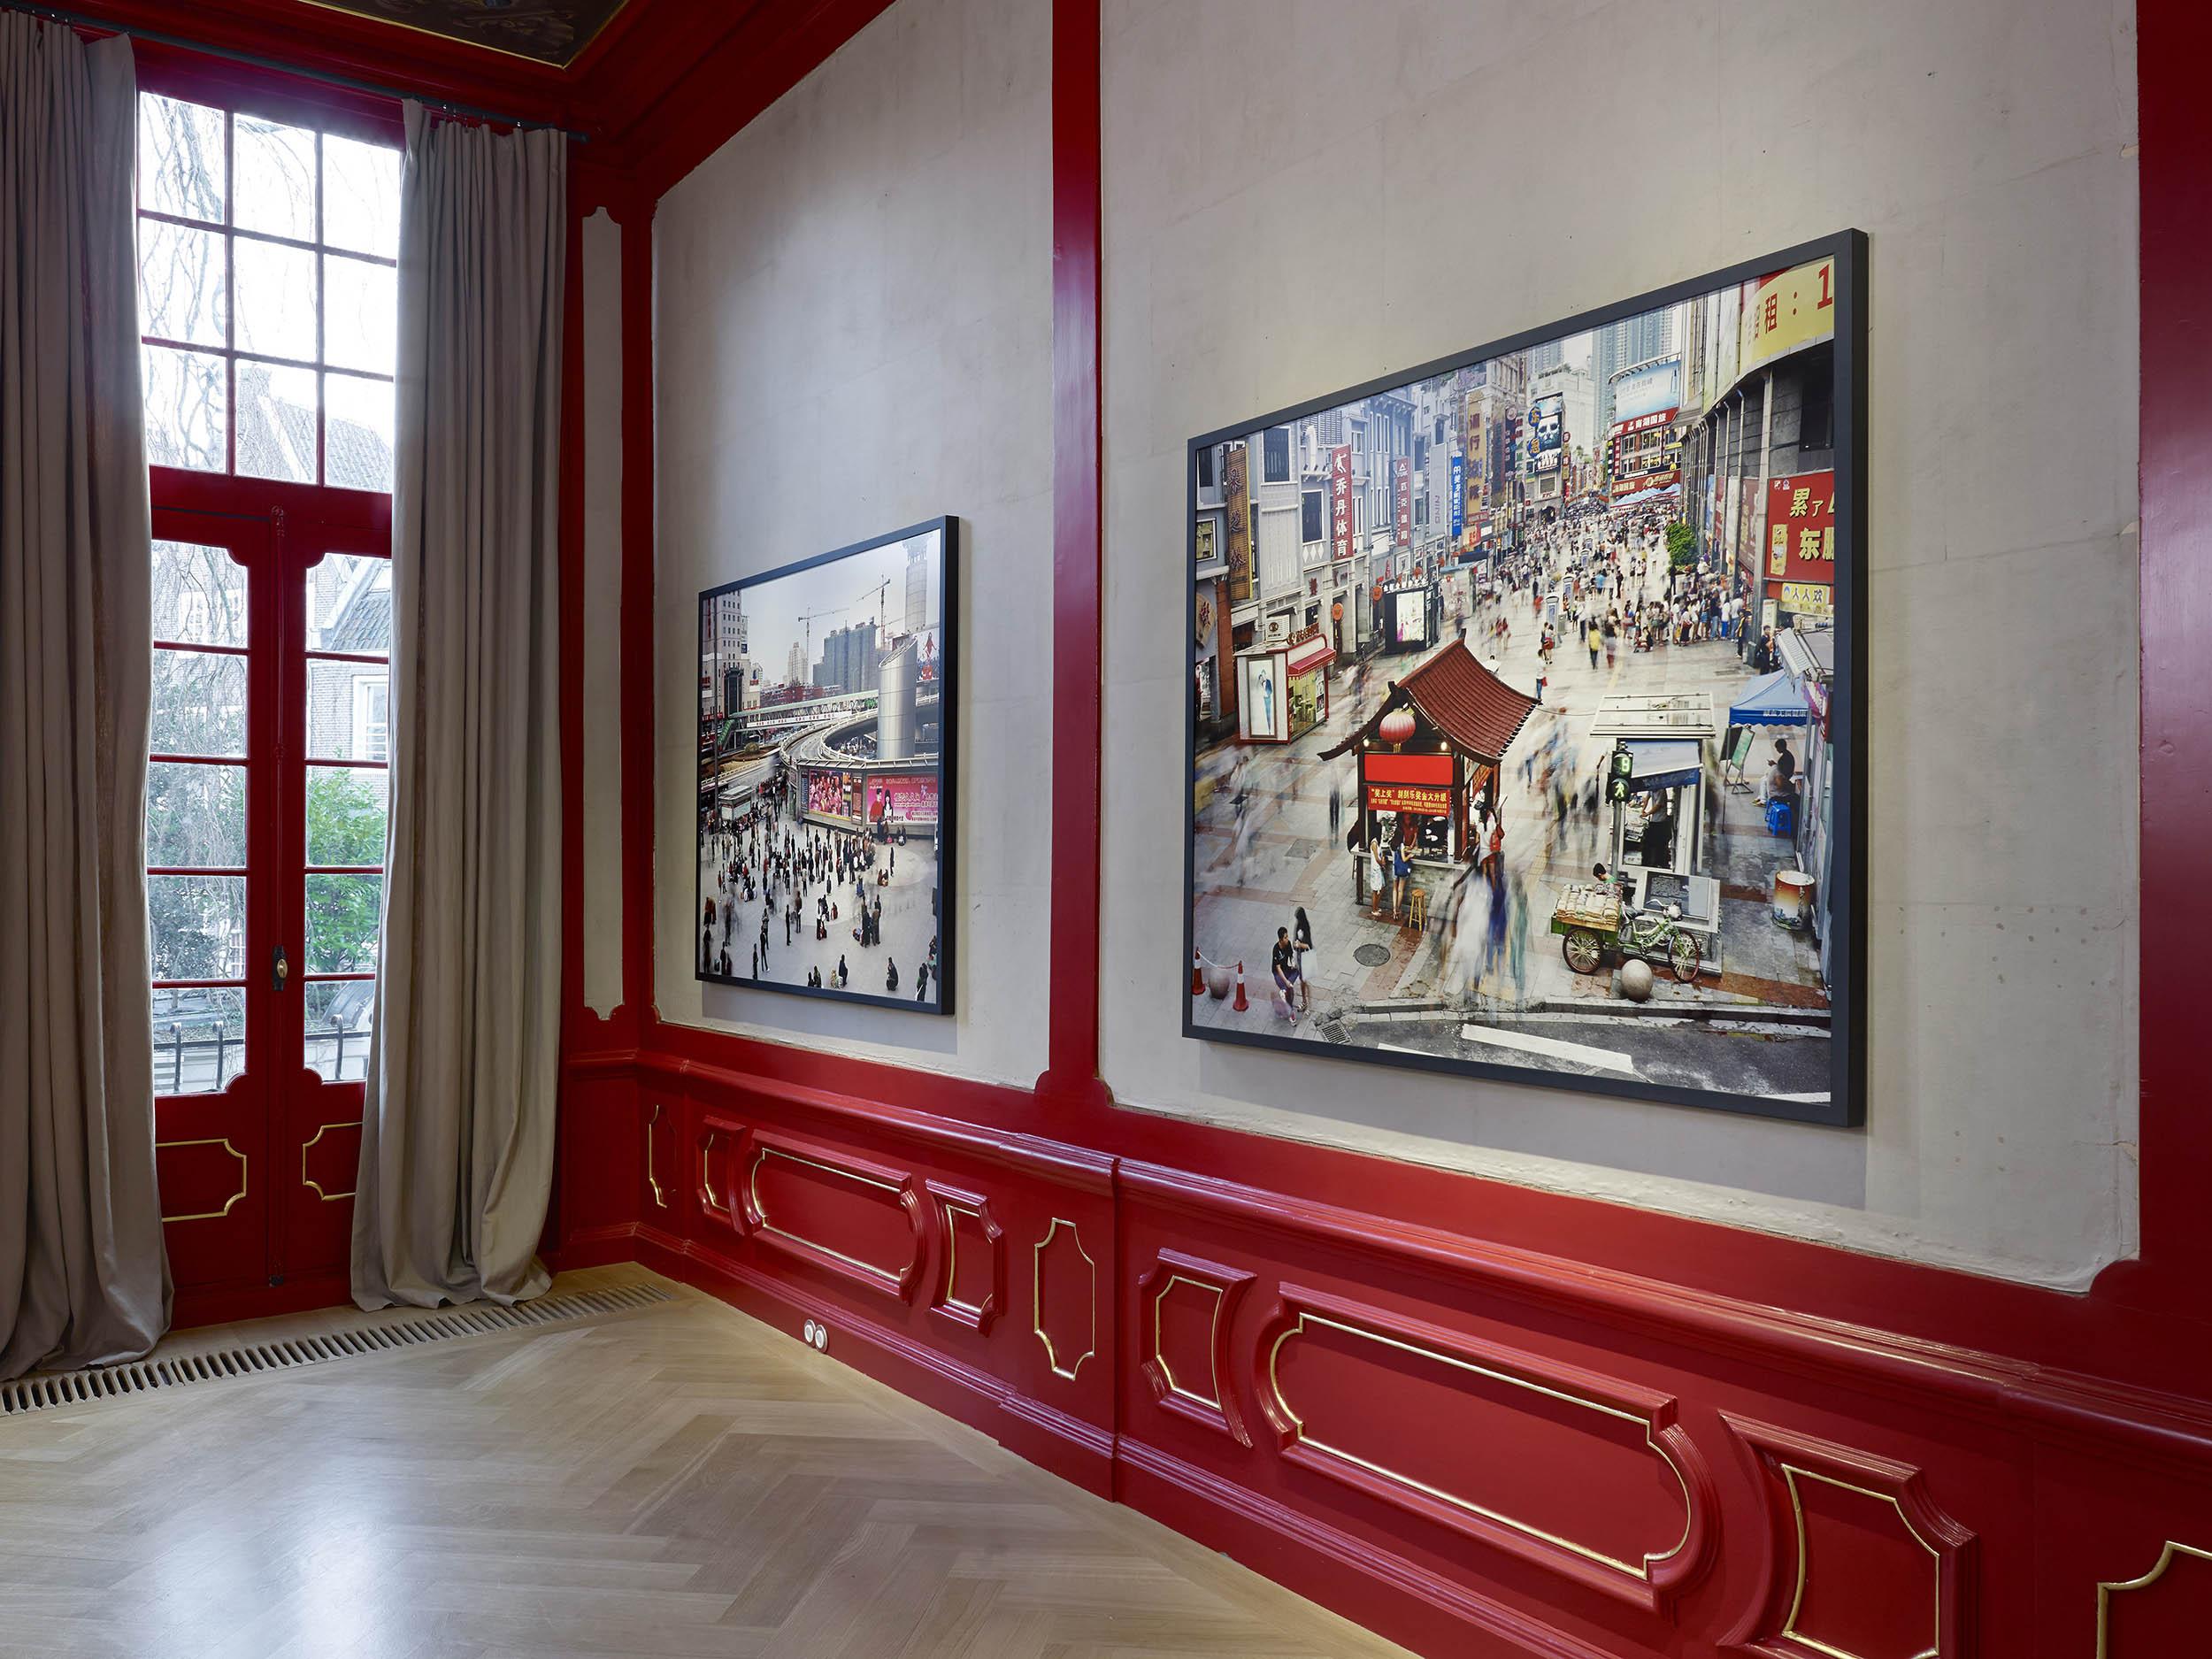 Huis Marseille, Amsterdam, 2015-2016